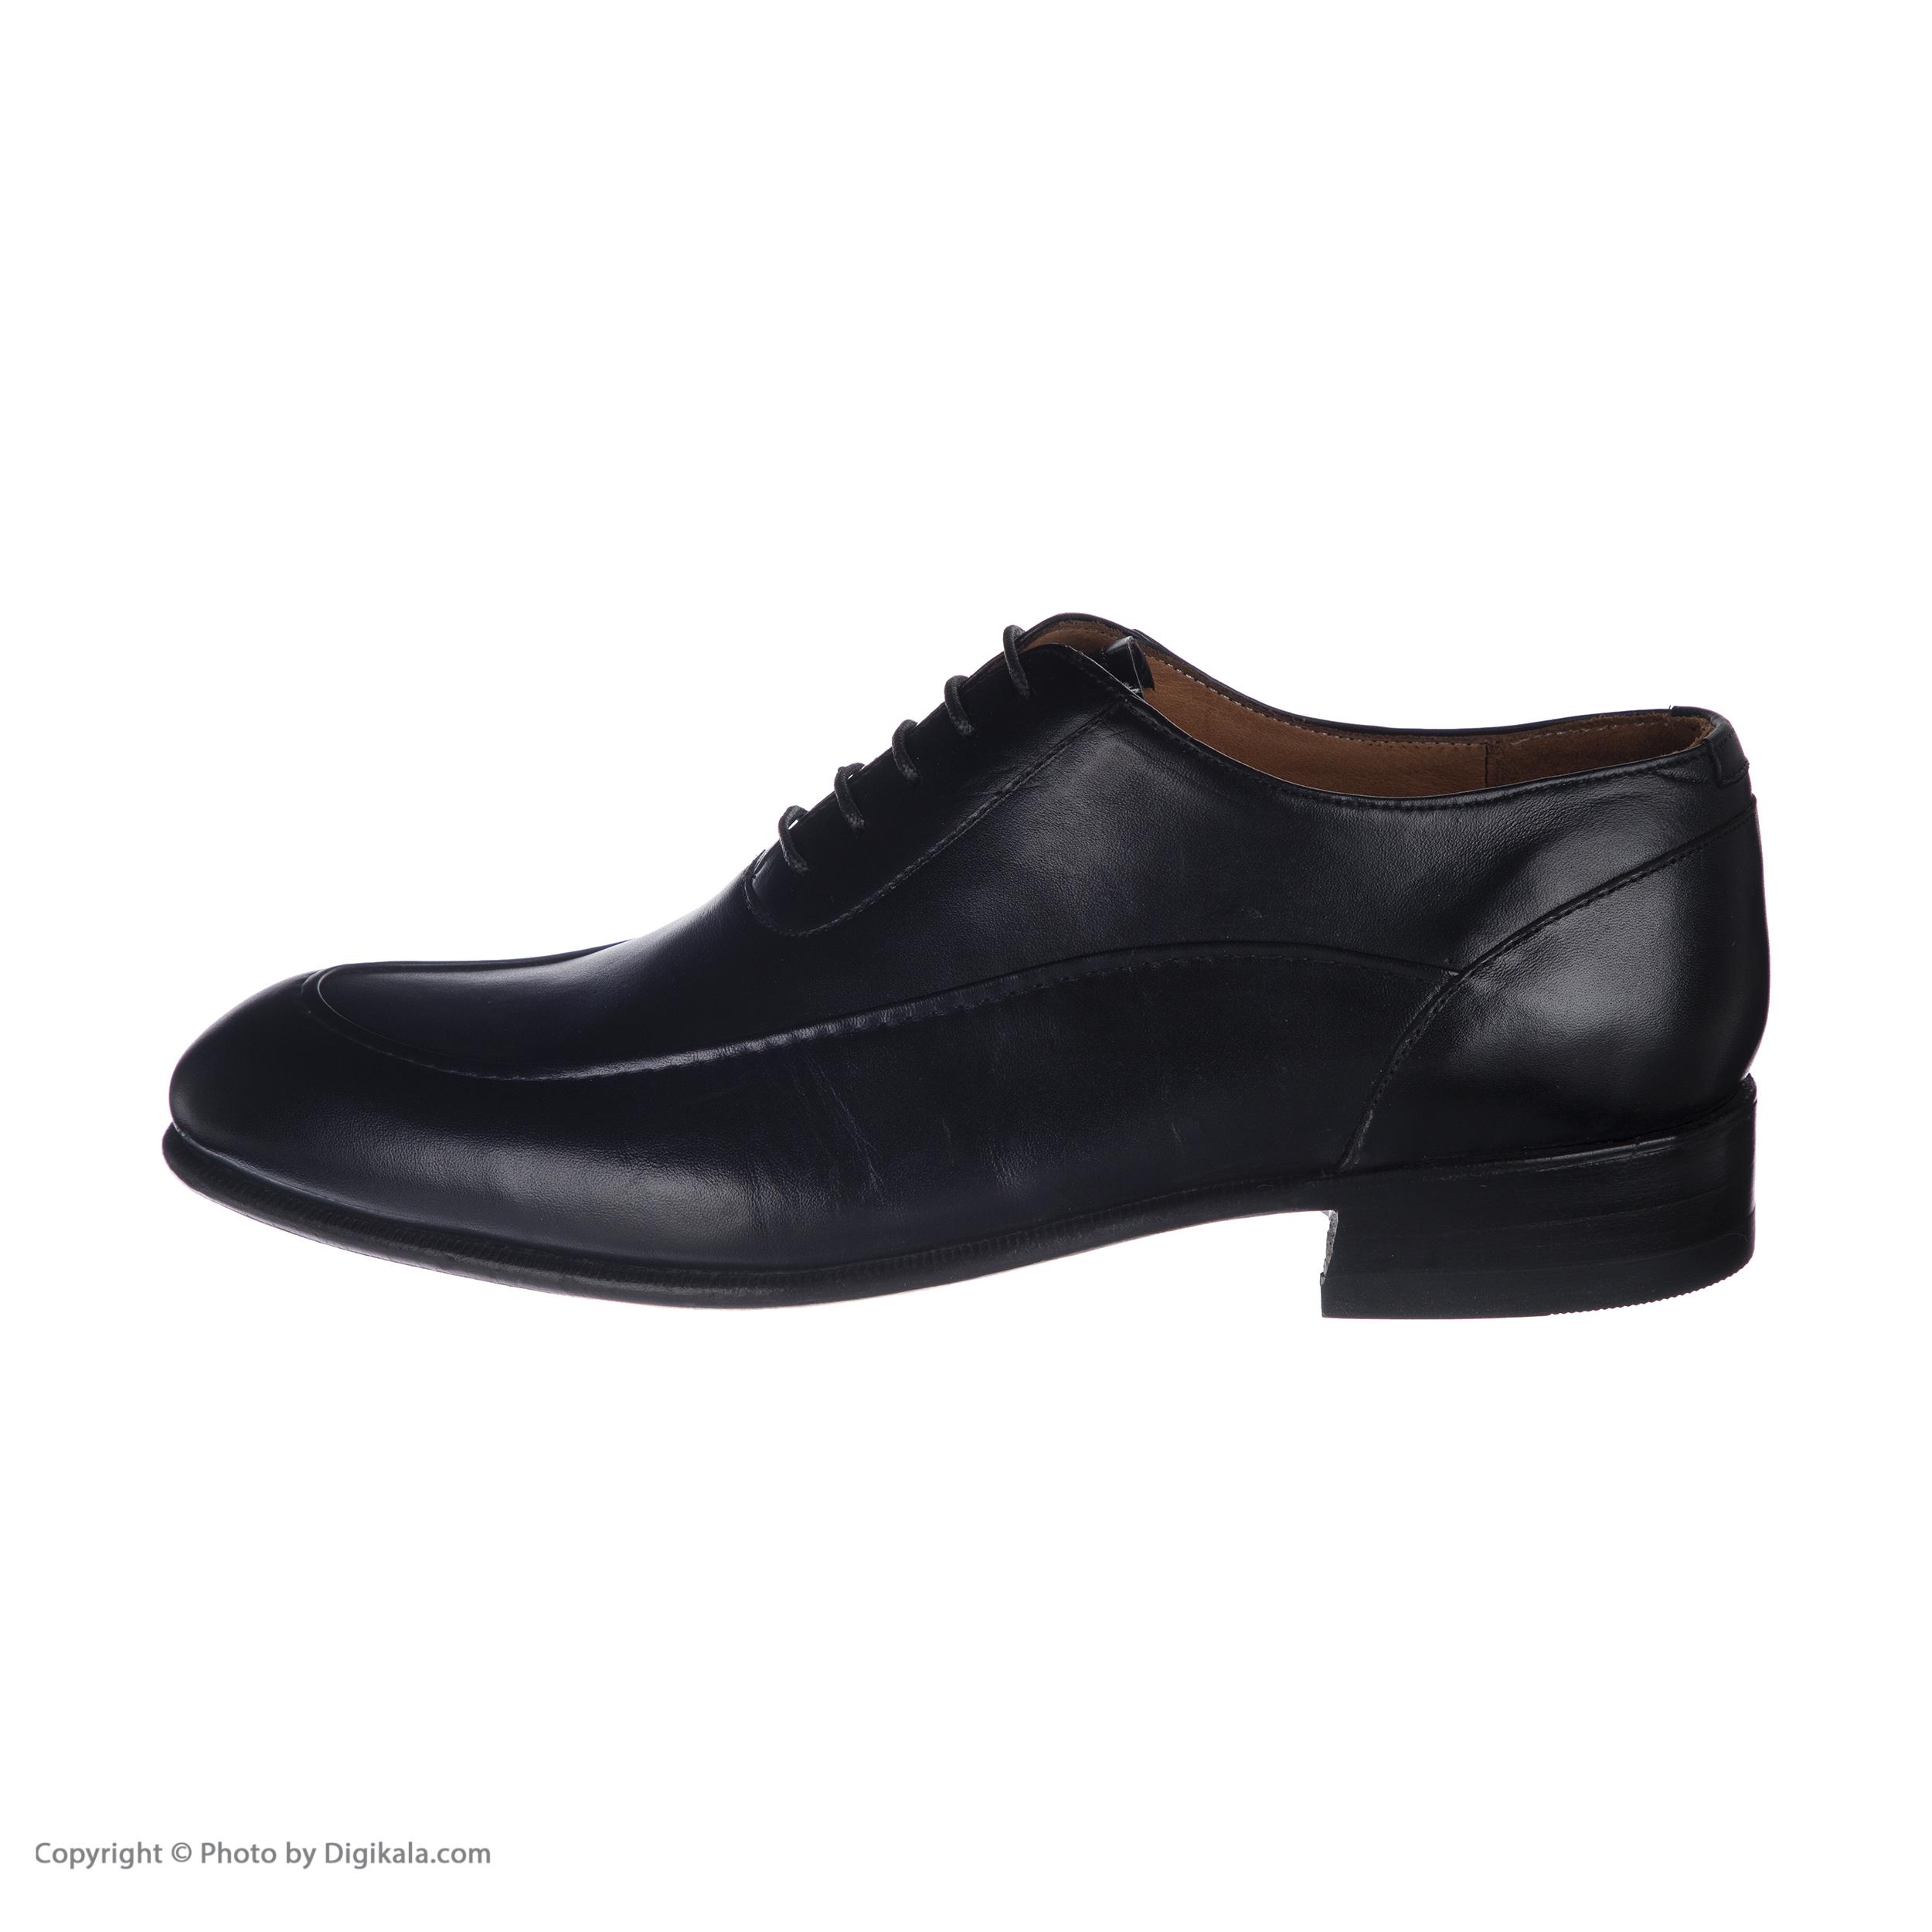 کفش مردانه نظری کد 425 -  - 1